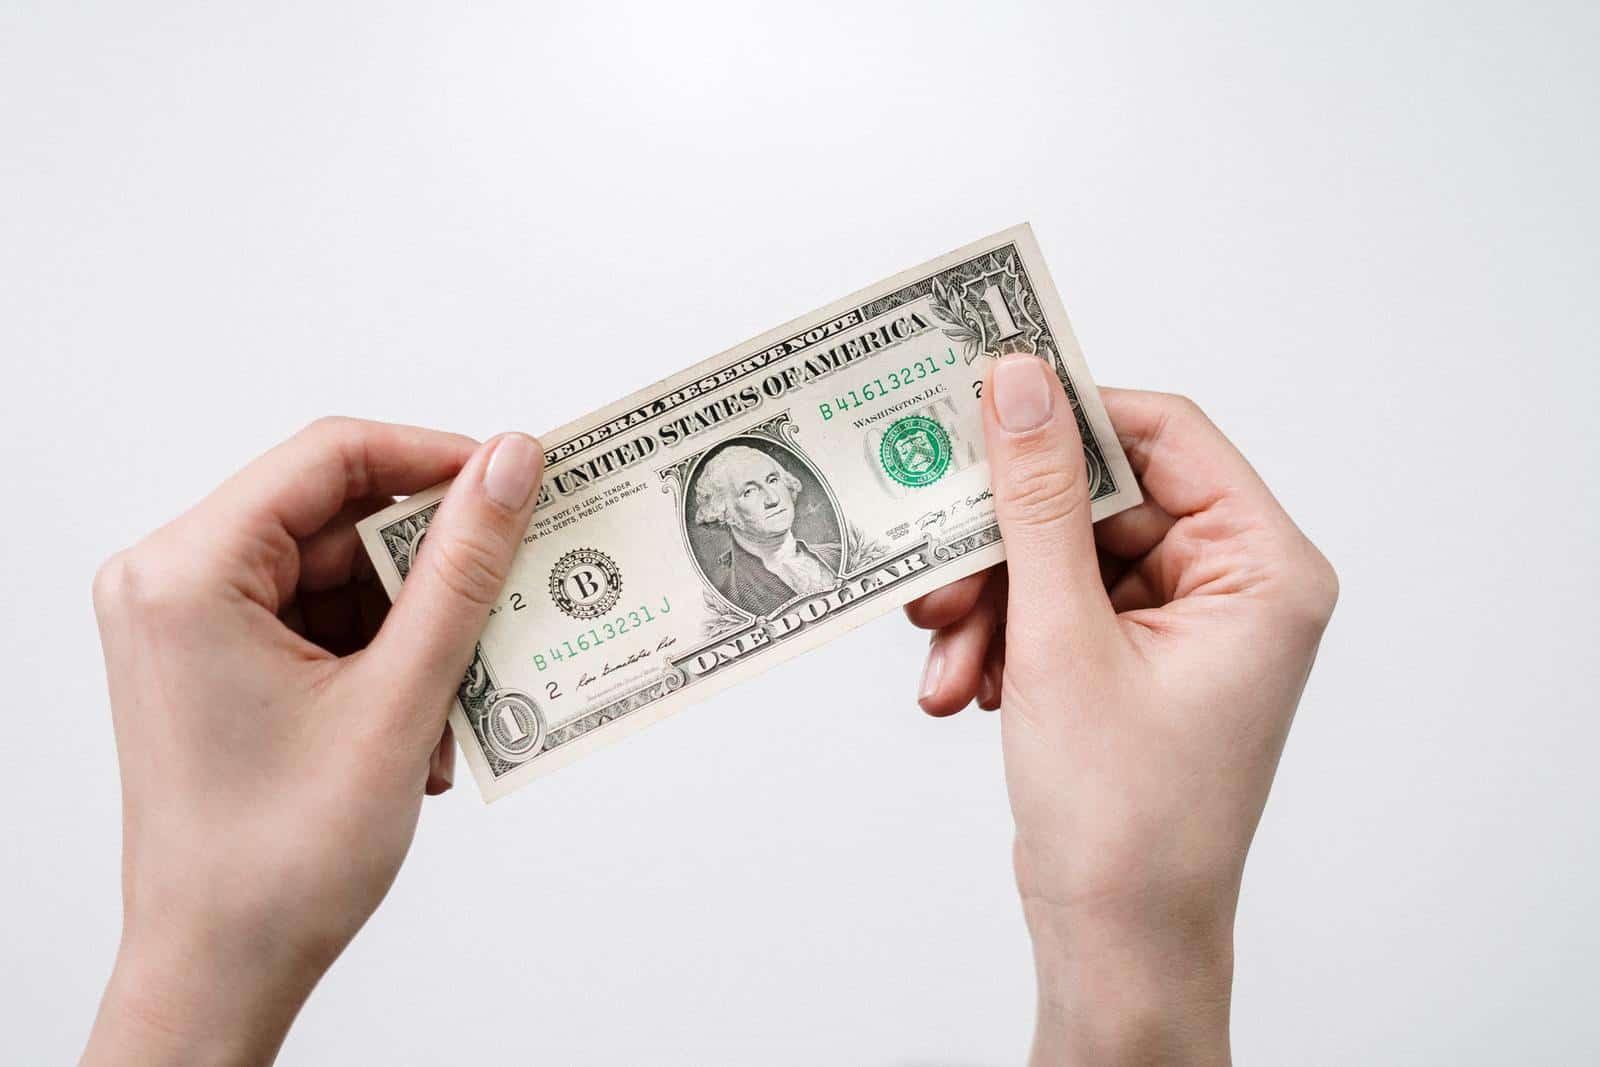 Person holding 1 dollar bill